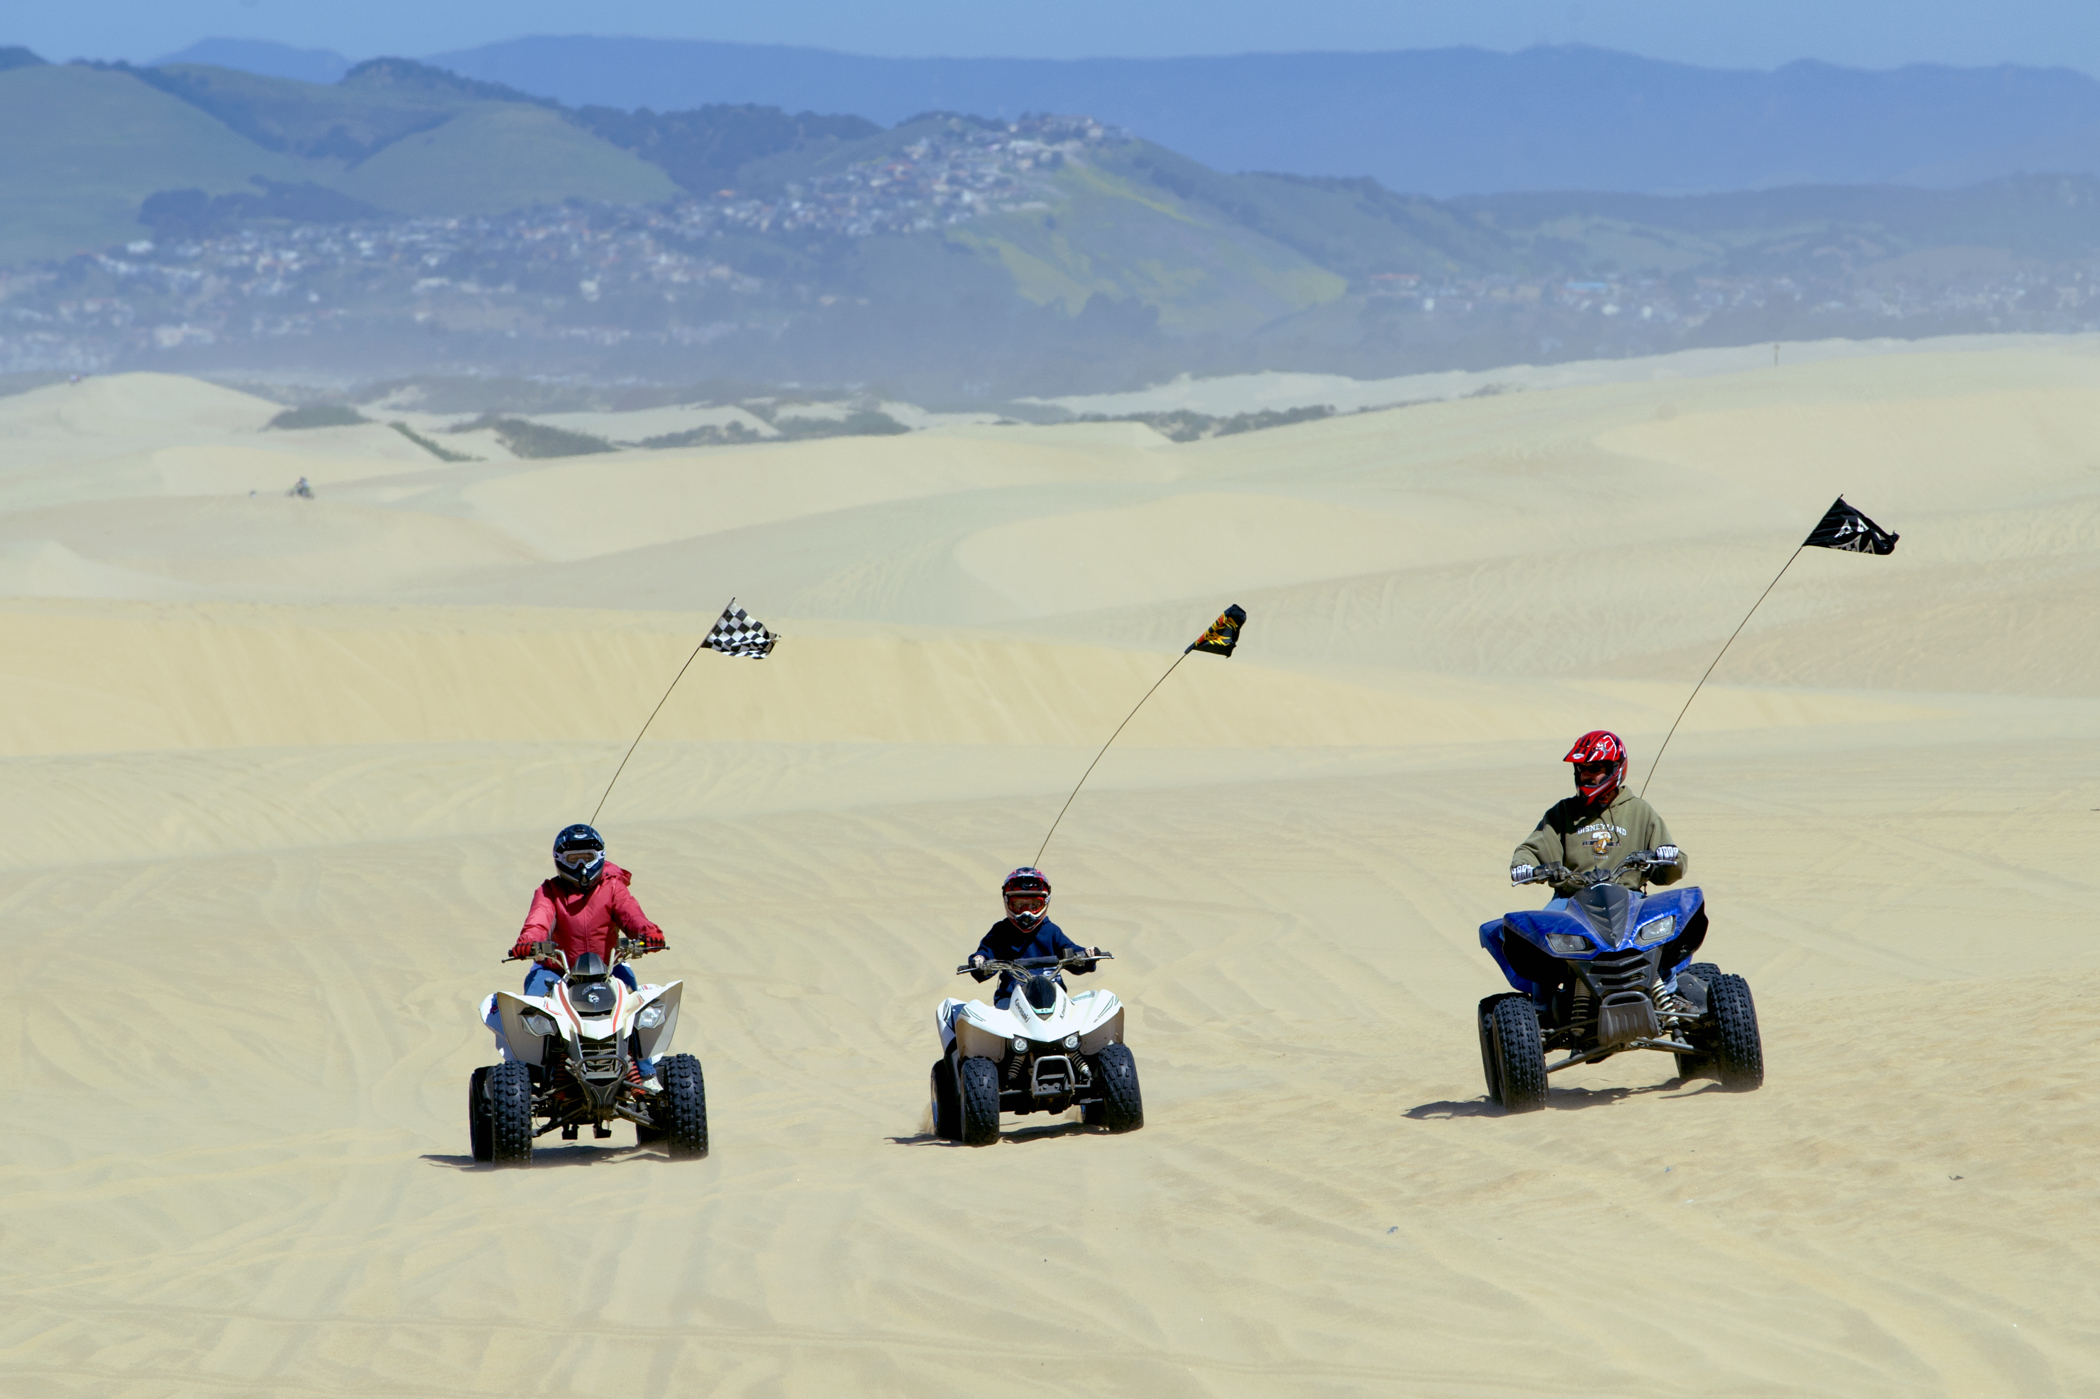 Oceano Dunes Safety Tips